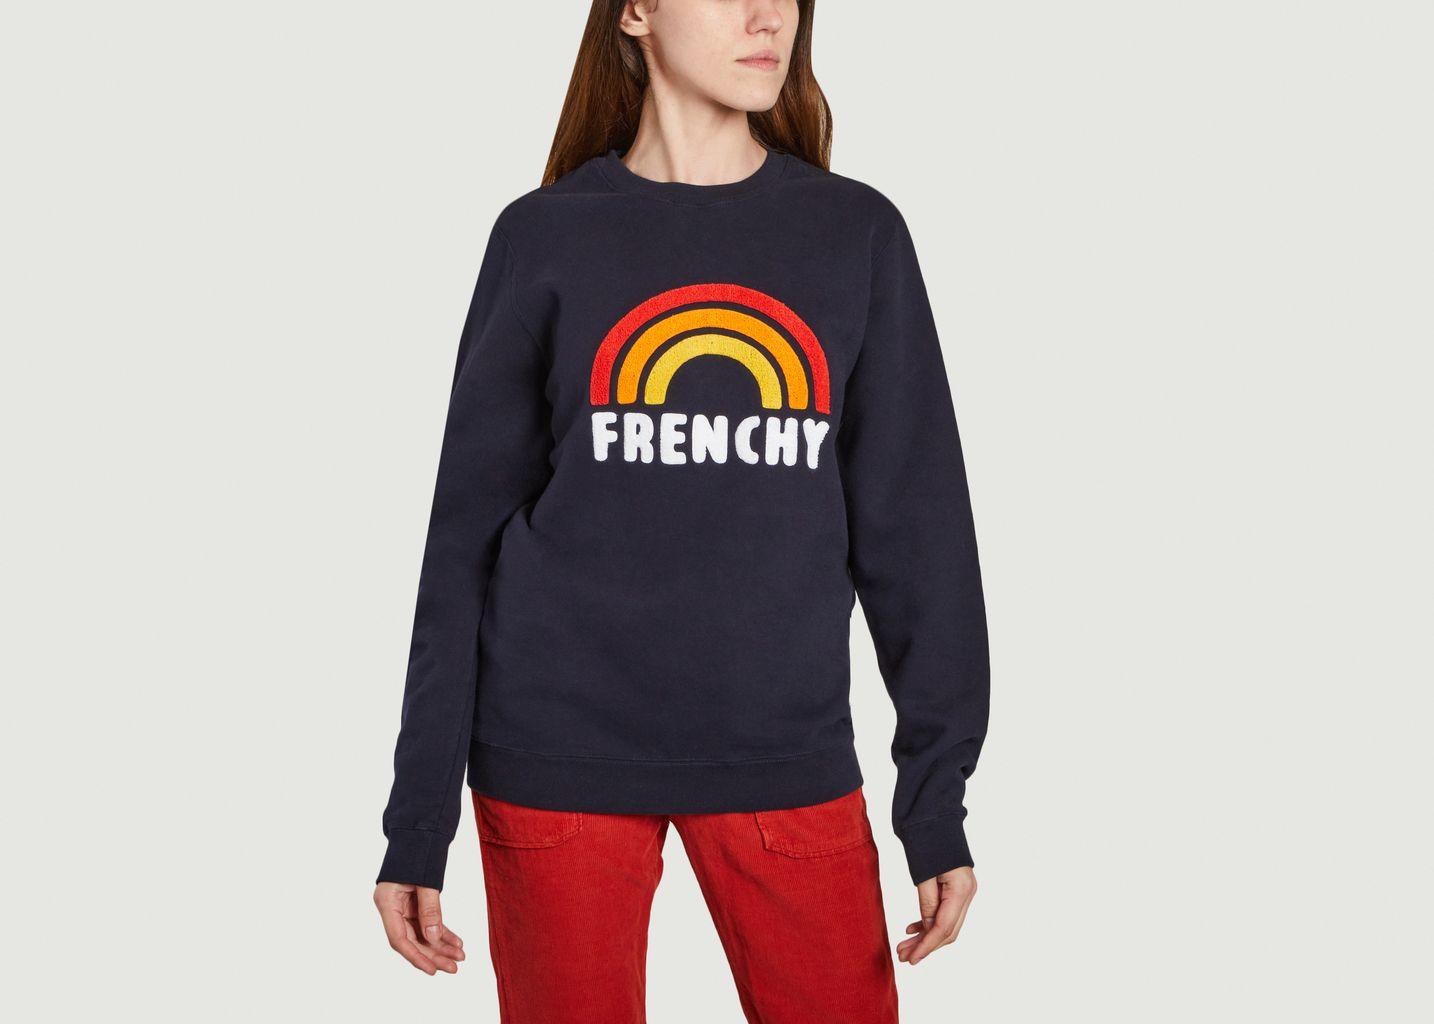 Sweatshirt Frenchy - French Disorder